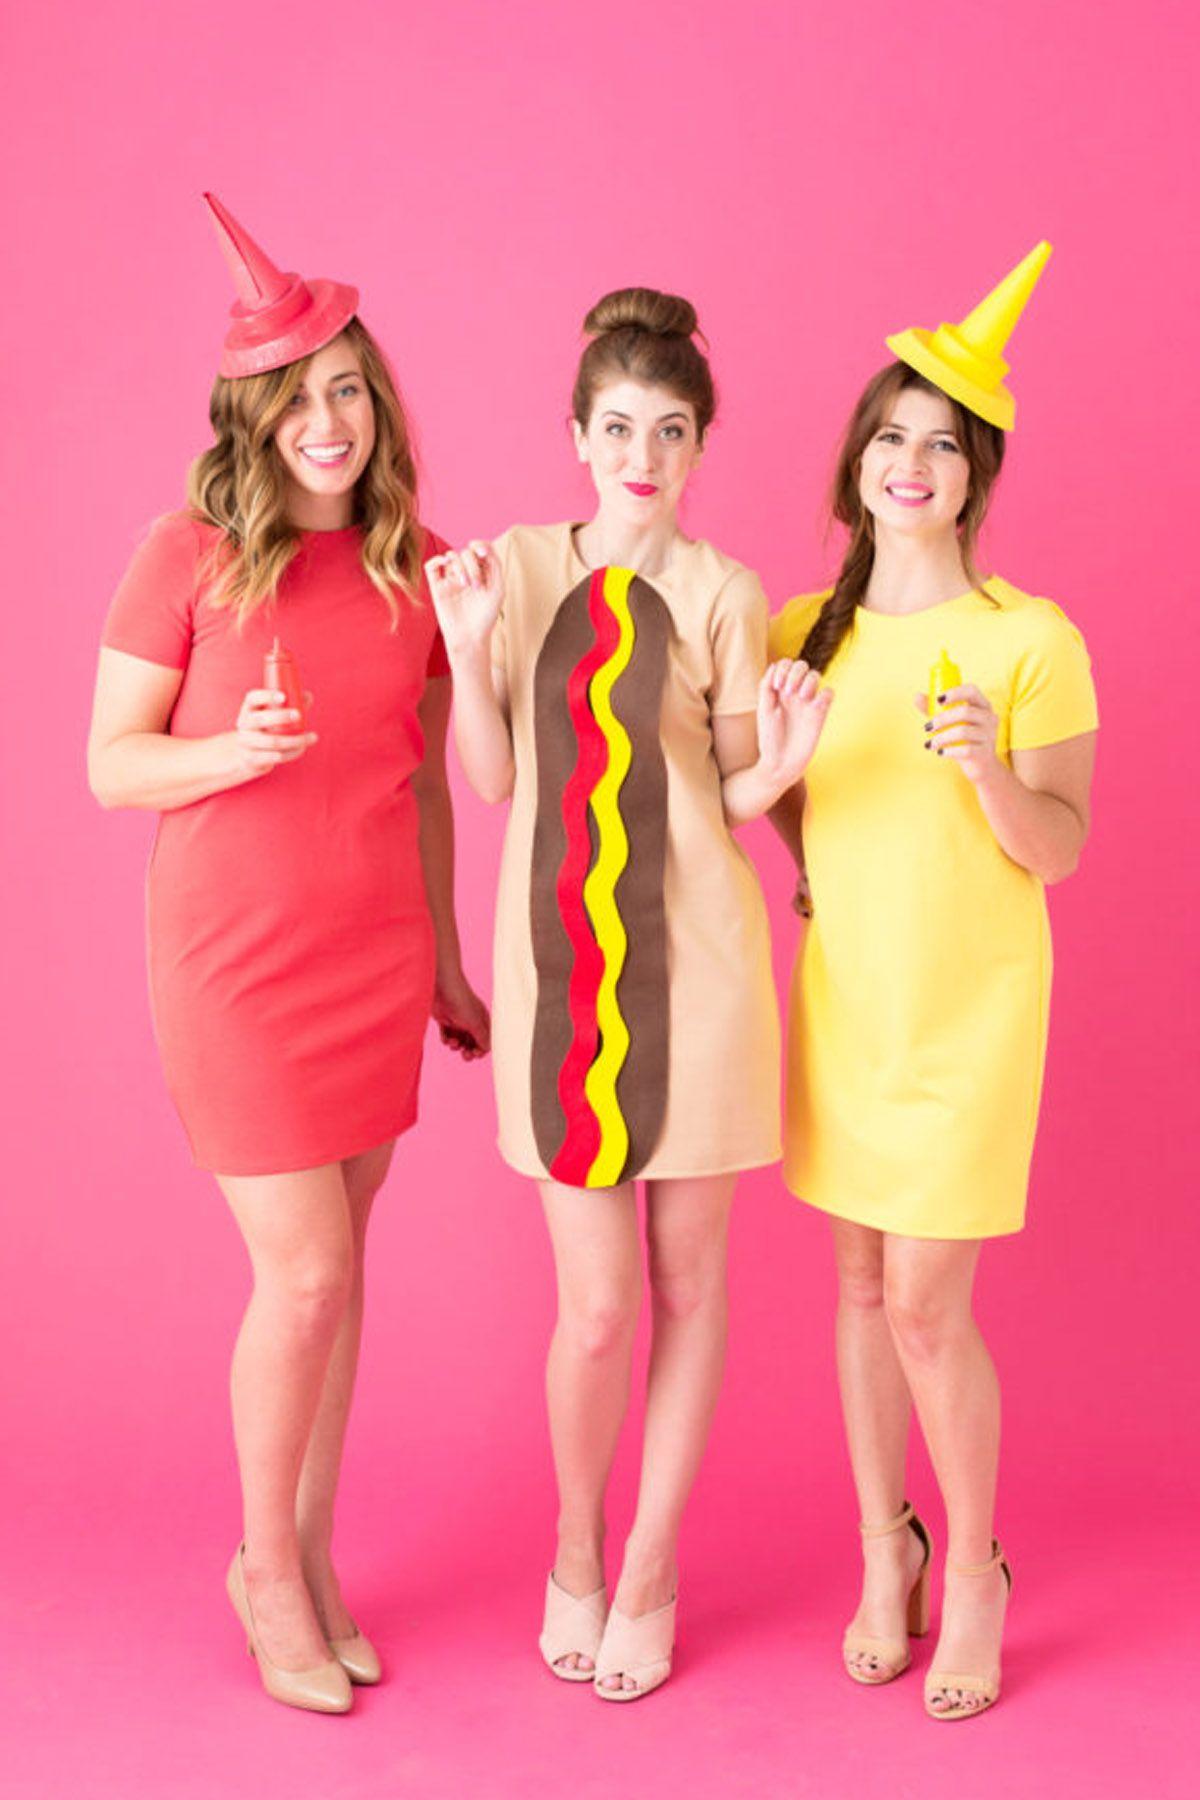 25 cute group halloween costume ideas - easy diy friend halloween